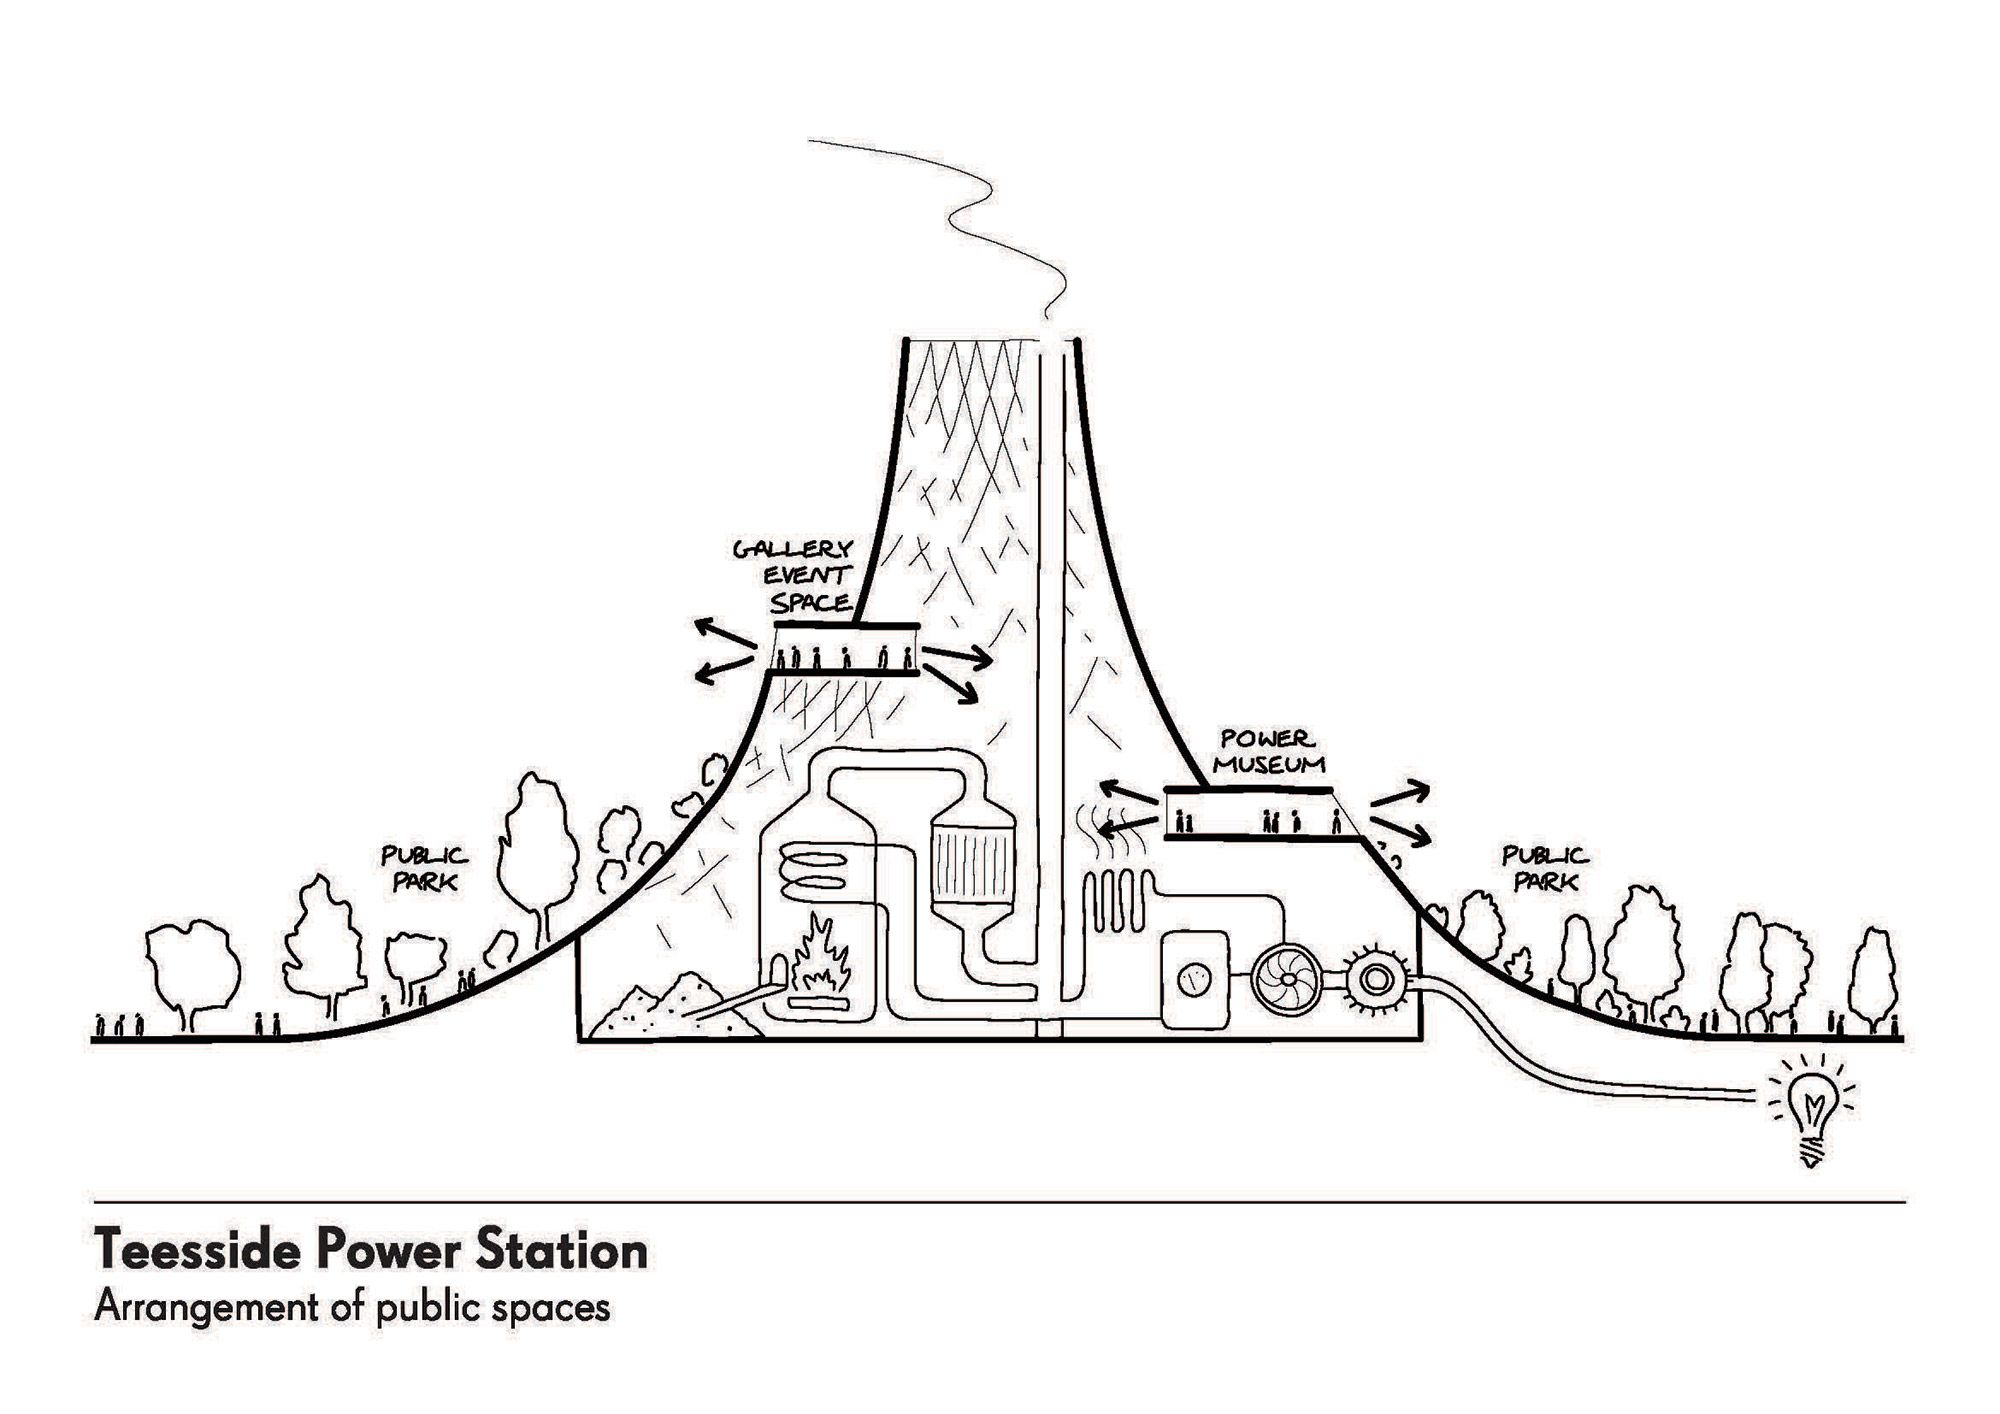 Heatherwick Studio Design Architecture Teesside Power Station Power Station Architecture Architecture Design